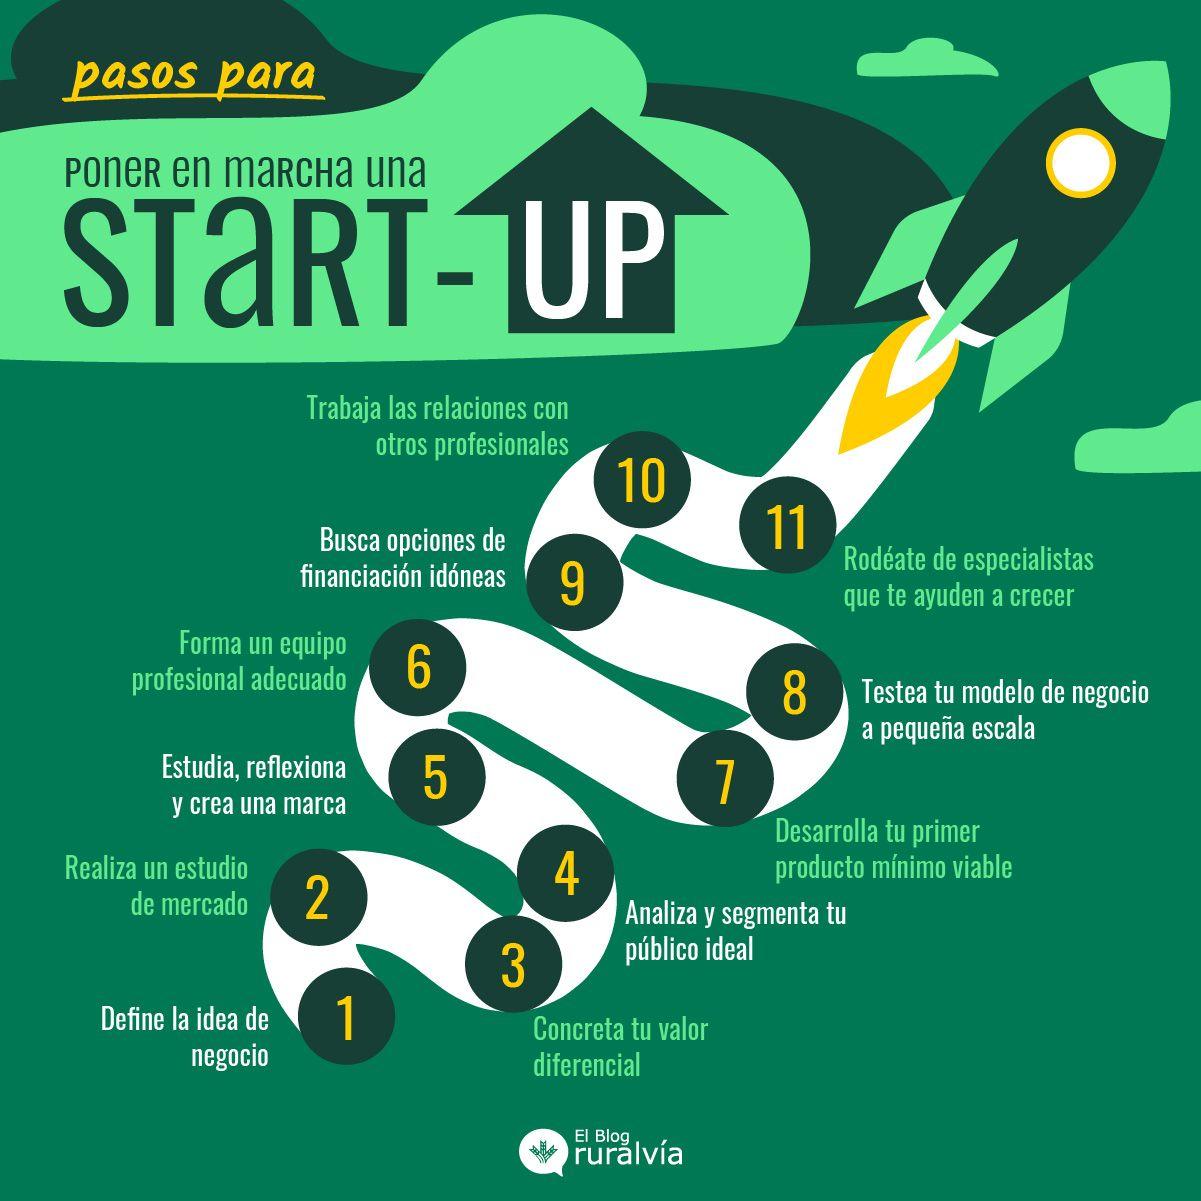 Consejos para iniciar una start-up